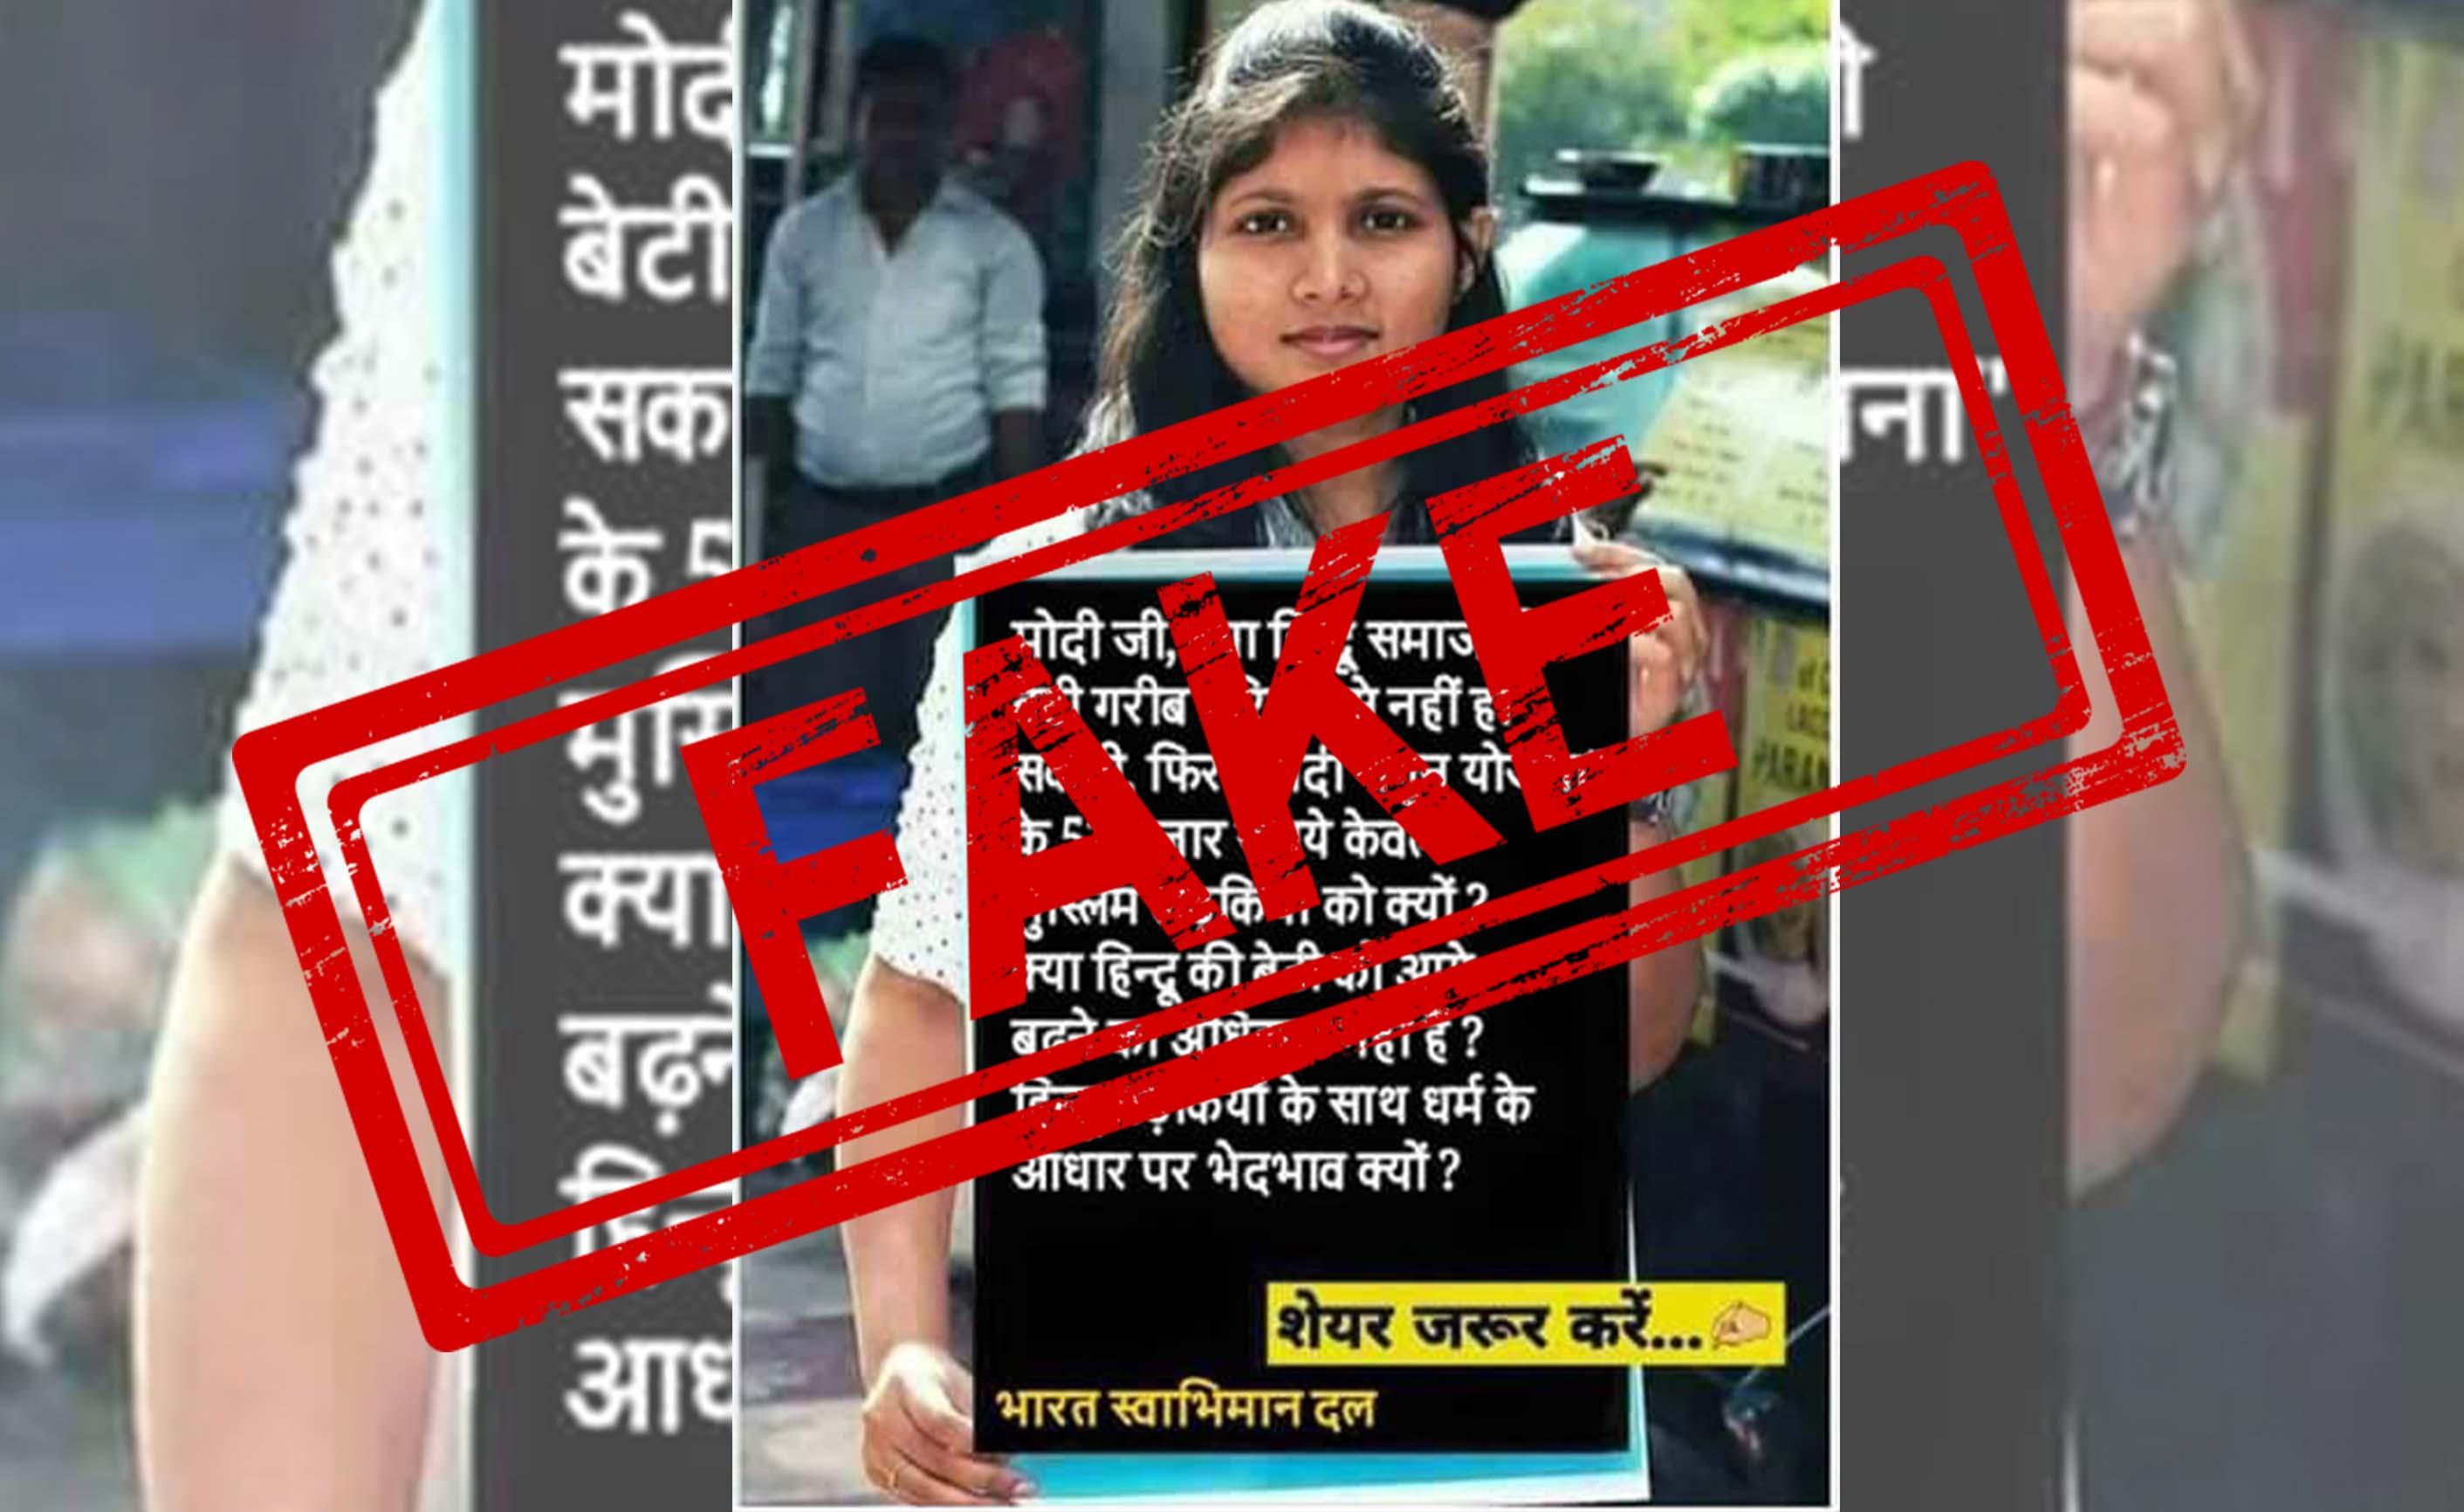 Girl, Prime Minister, Narendra Modi, NewsMobile, Mobile News, India, Fact Check, Fact Checker, Fake, News